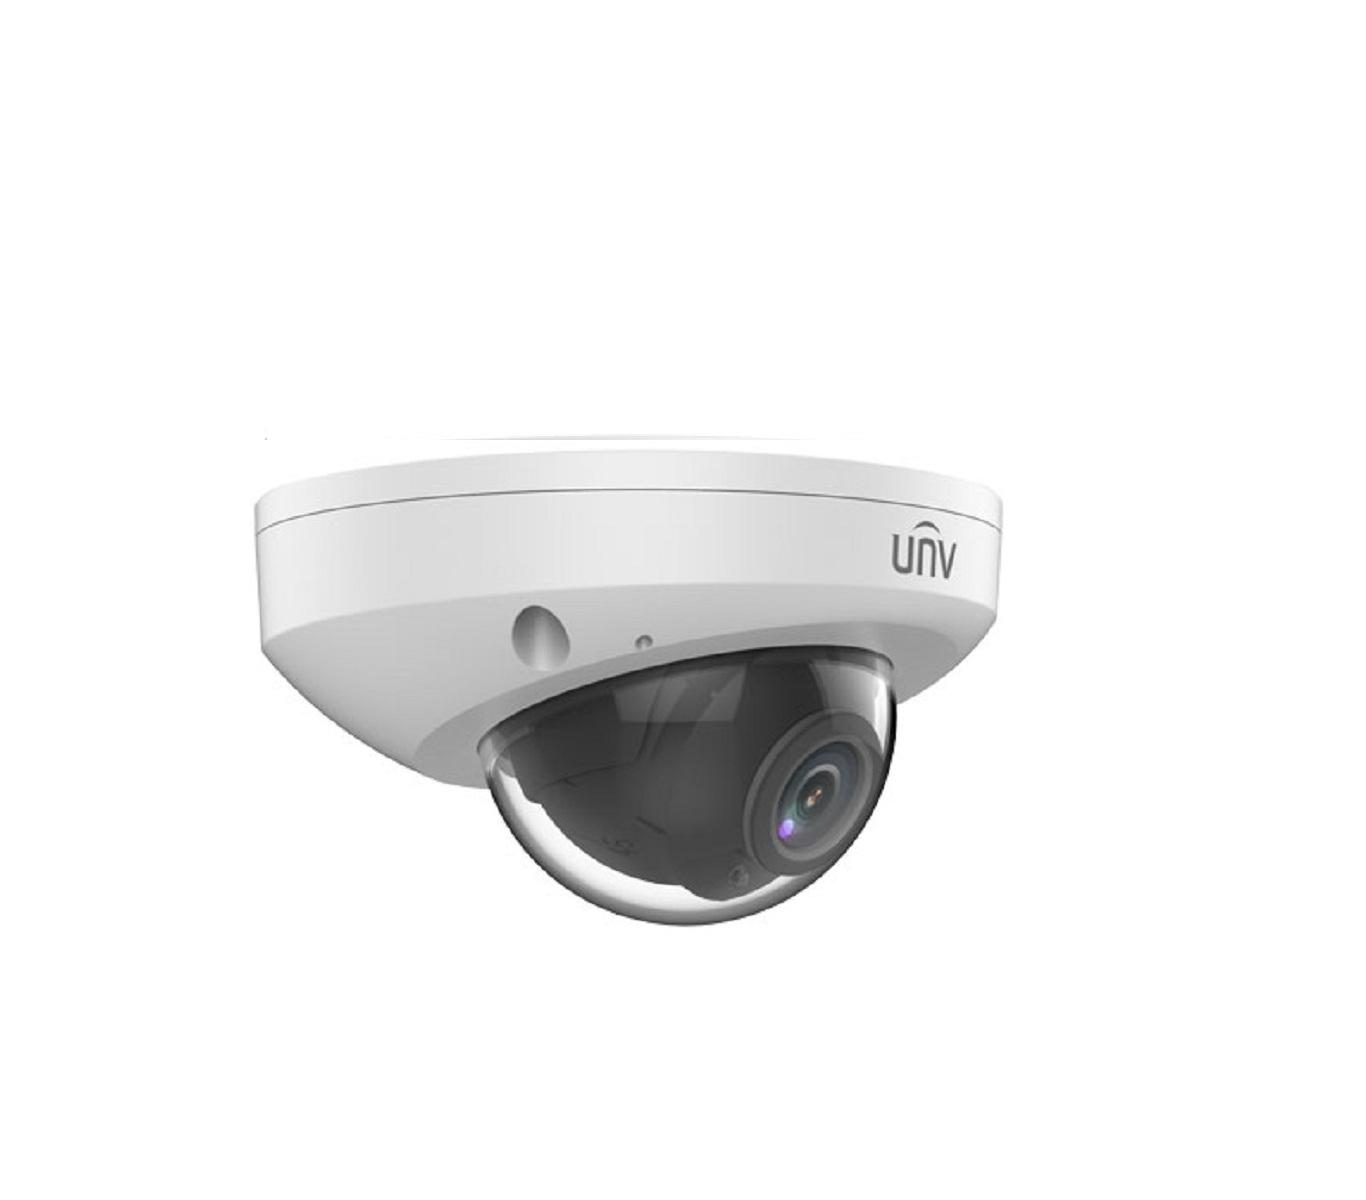 Camera IP BÁN CẦU HỒNG NGOẠI IPC3232LR3-VSPZ28-D